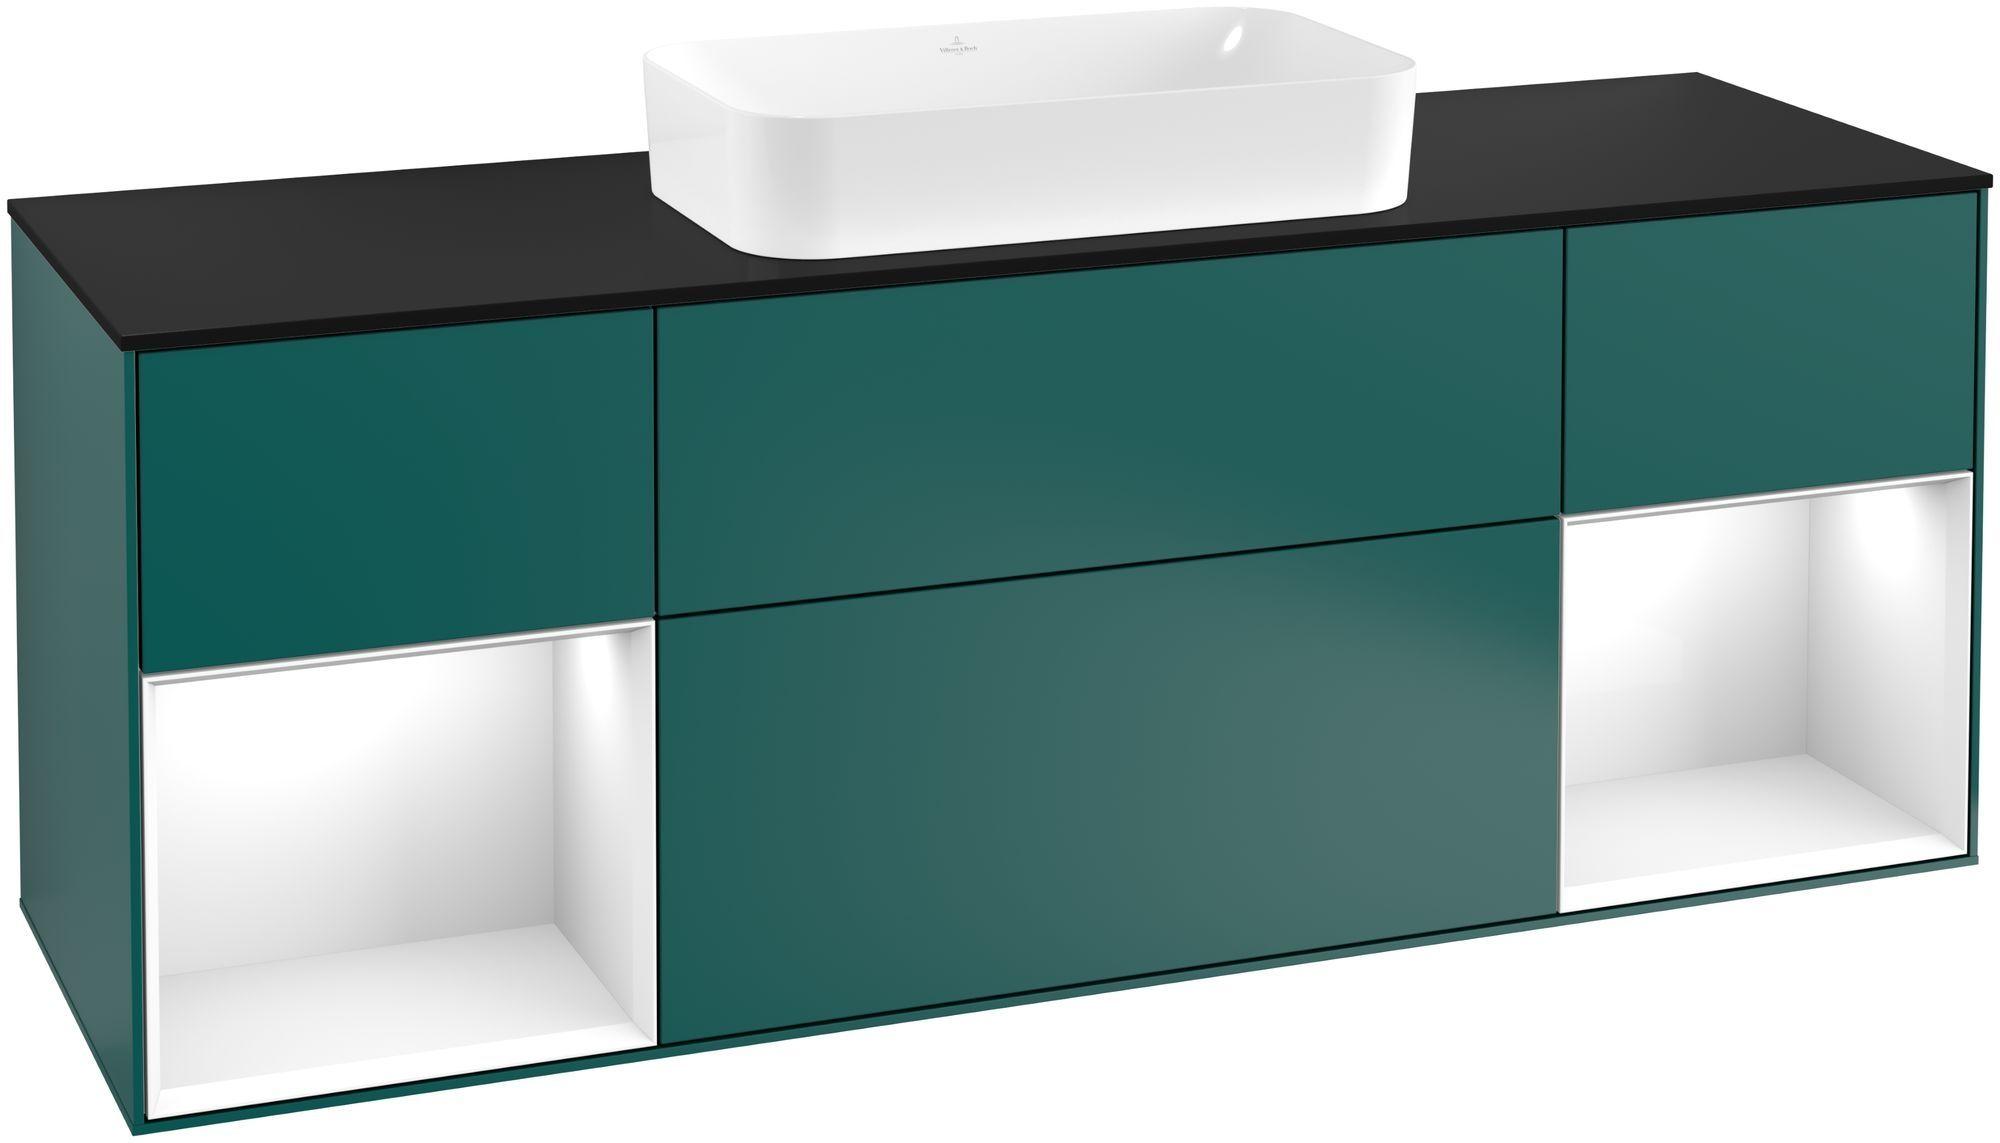 Villeroy & Boch Finion G33 Waschtischunterschrank mit Regalelement 4 Auszüge Waschtisch mittig LED-Beleuchtung B:160xH:60,3xT:50,1cm Front, Korpus: Cedar, Regal: Glossy White Lack, Glasplatte: Black Matt G332GFGS